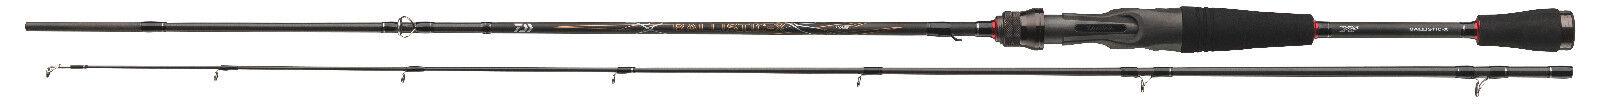 Daiwa Ballistic X Spin / Baitcast / Seatrout / alle Jiggerspin Spinnrute alle / Modelle 438794